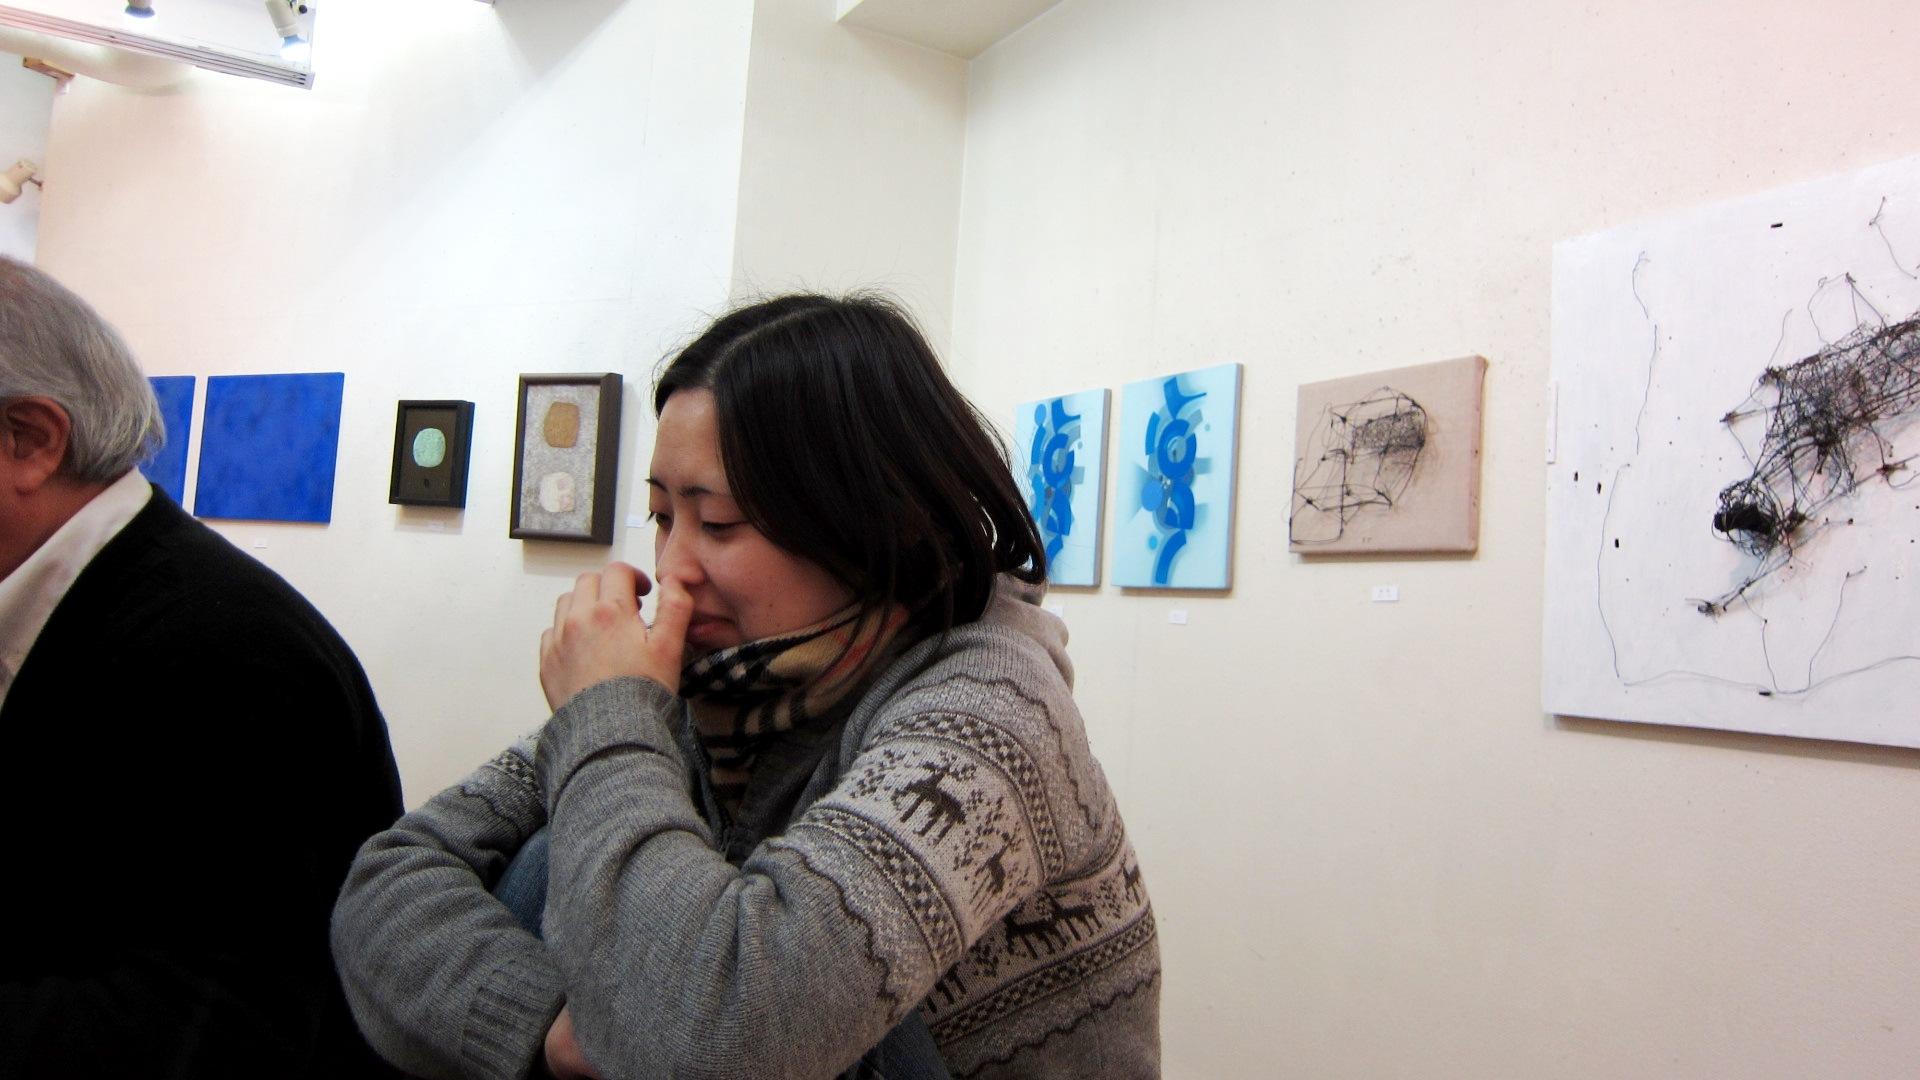 2354) 「LA`TAPIO -Ⅱ- Exhibition」 たぴお 1月27日(月)~2月15日(土)_f0126829_11262292.jpg